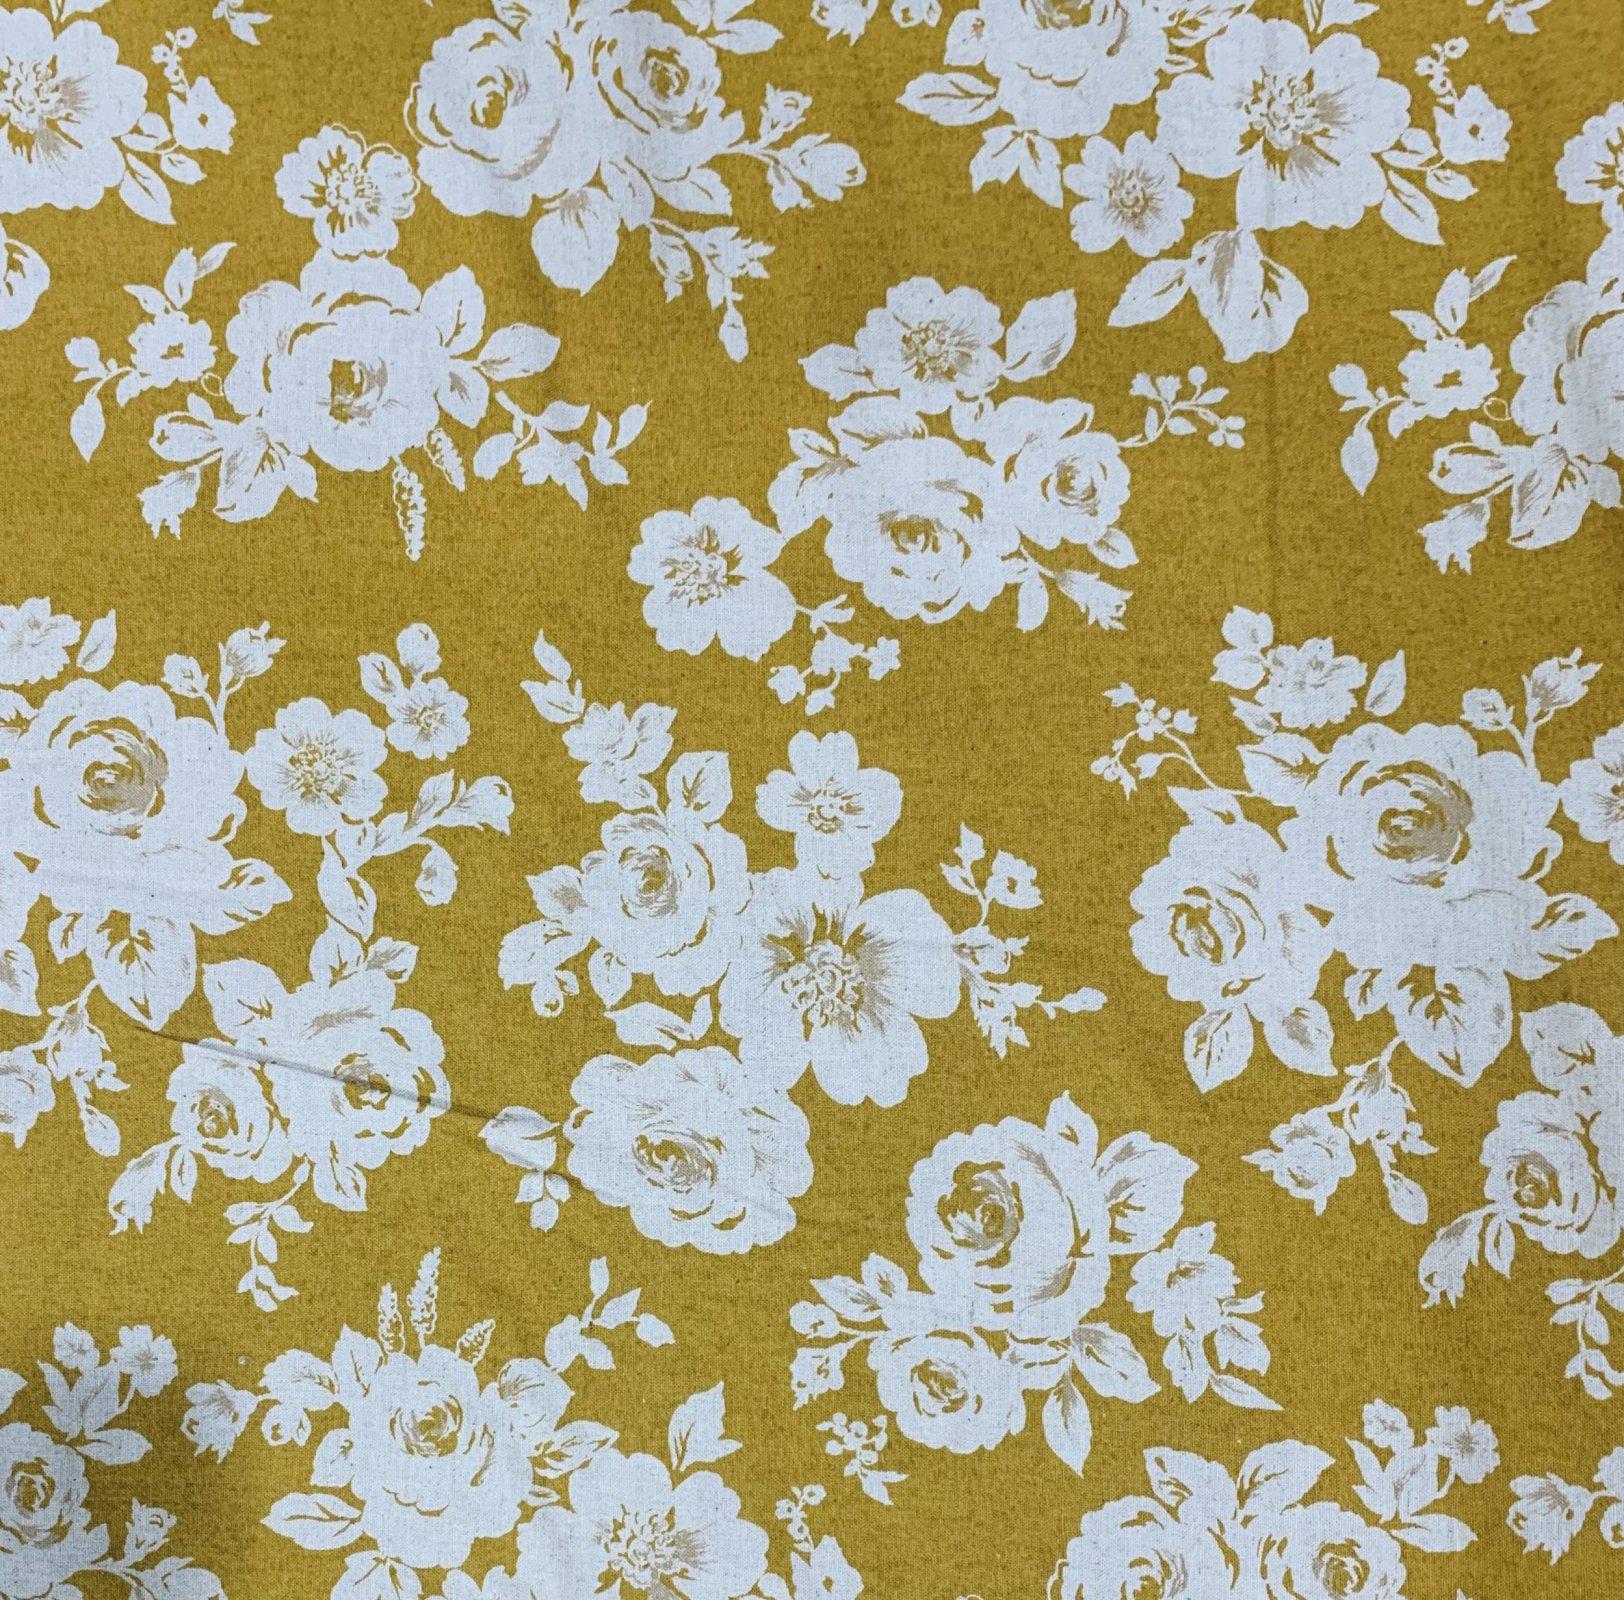 Kokka Fabric - Mustard Floral